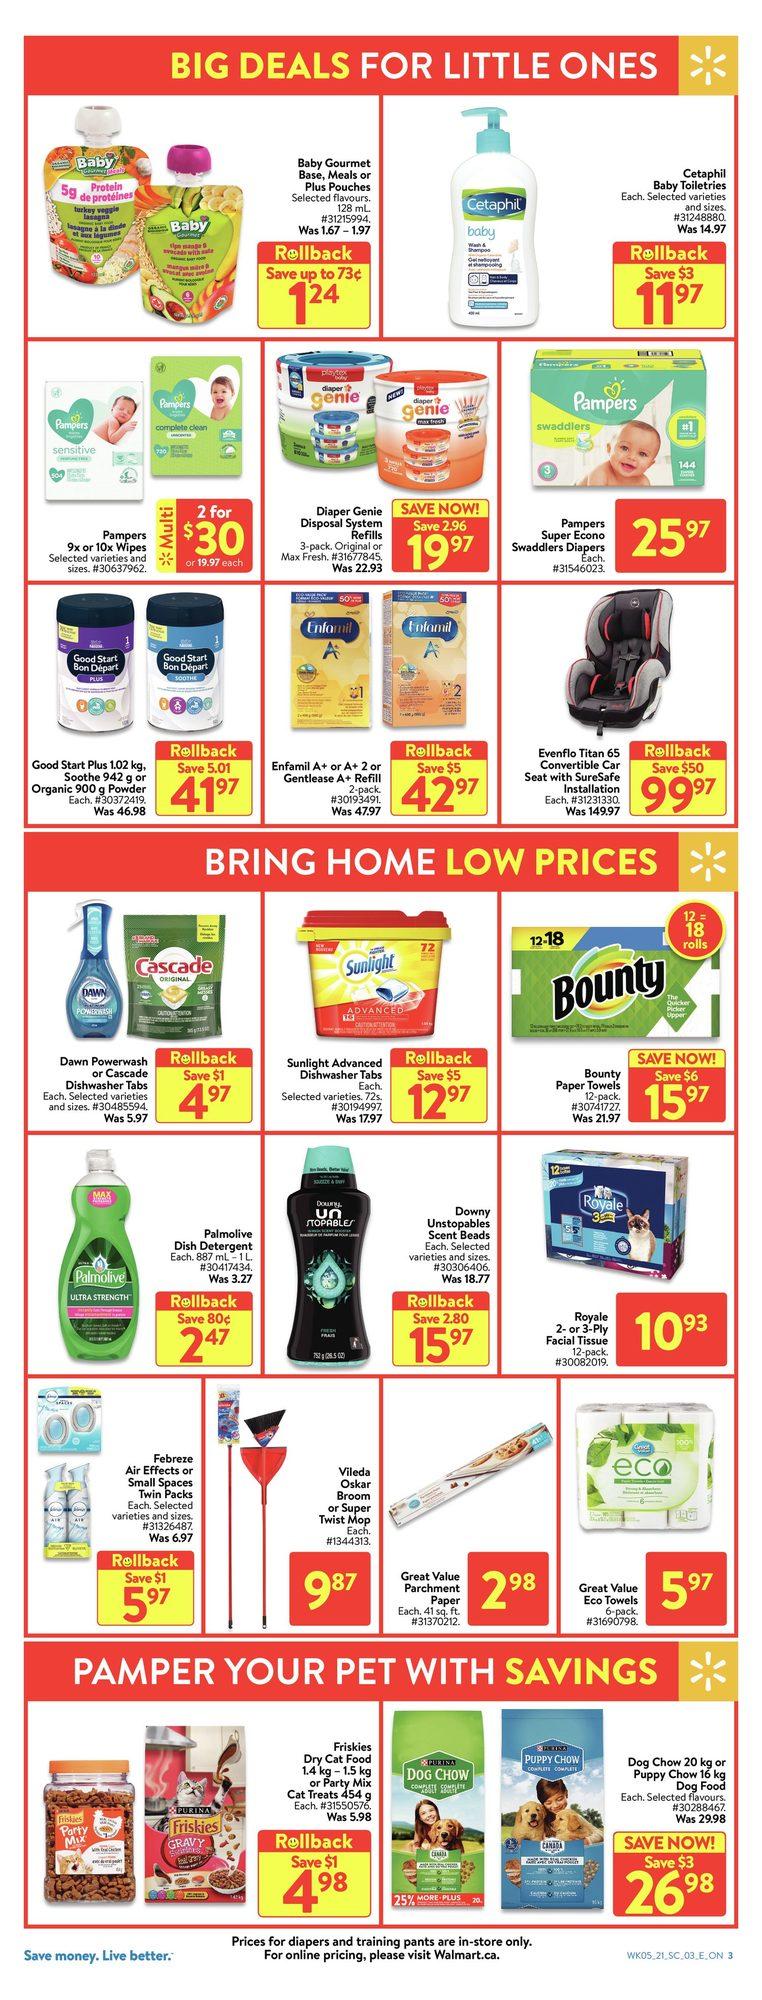 Walmart - Weekly Flyer Specials - Page 8